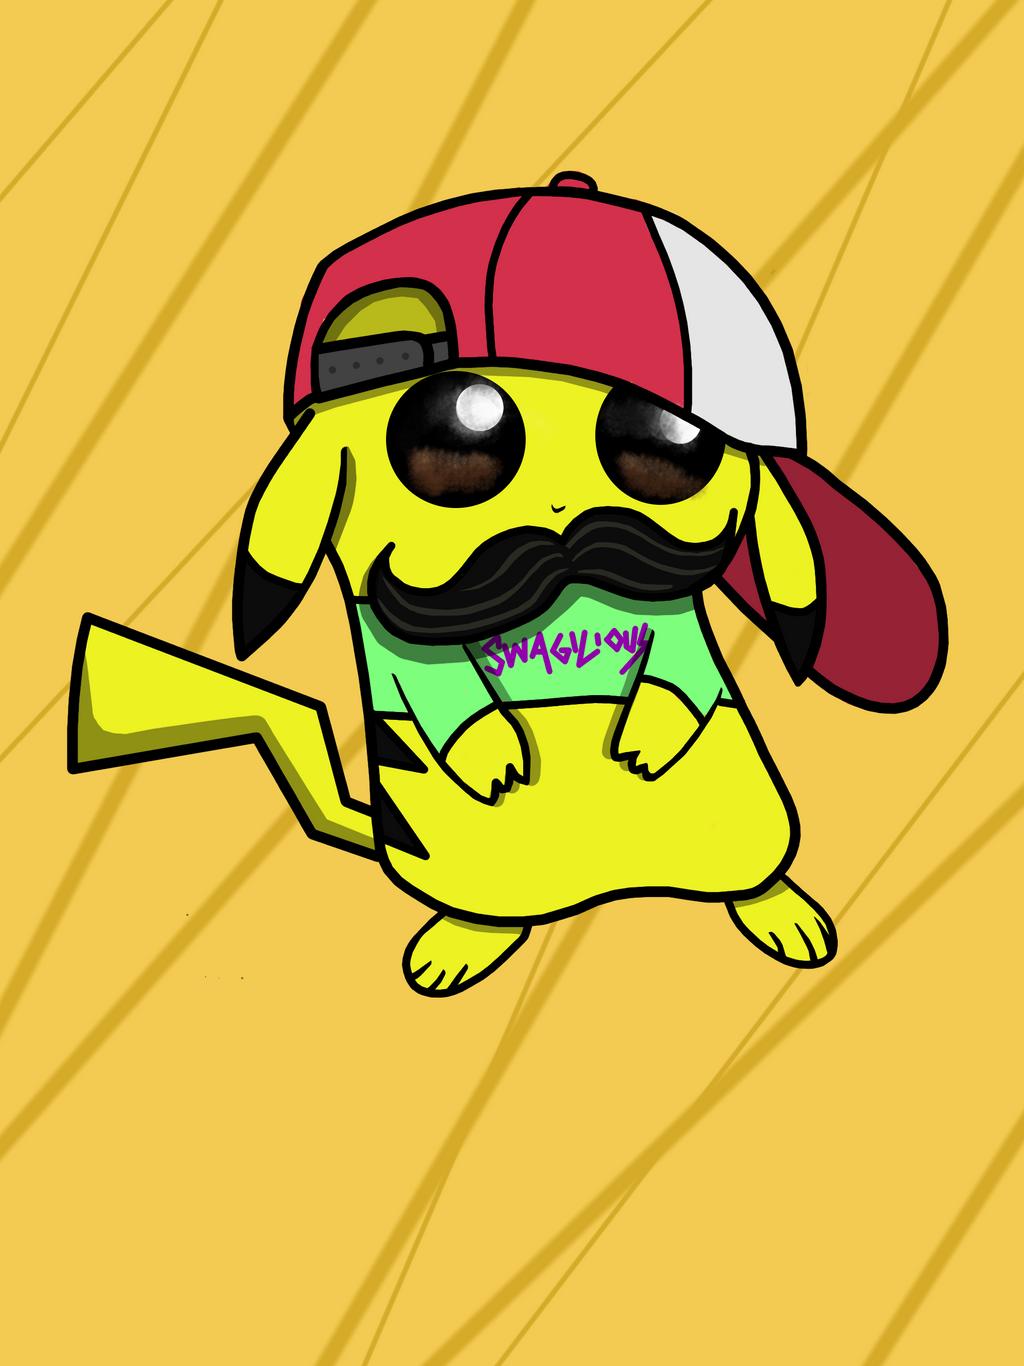 gangster pikachu - photo #45